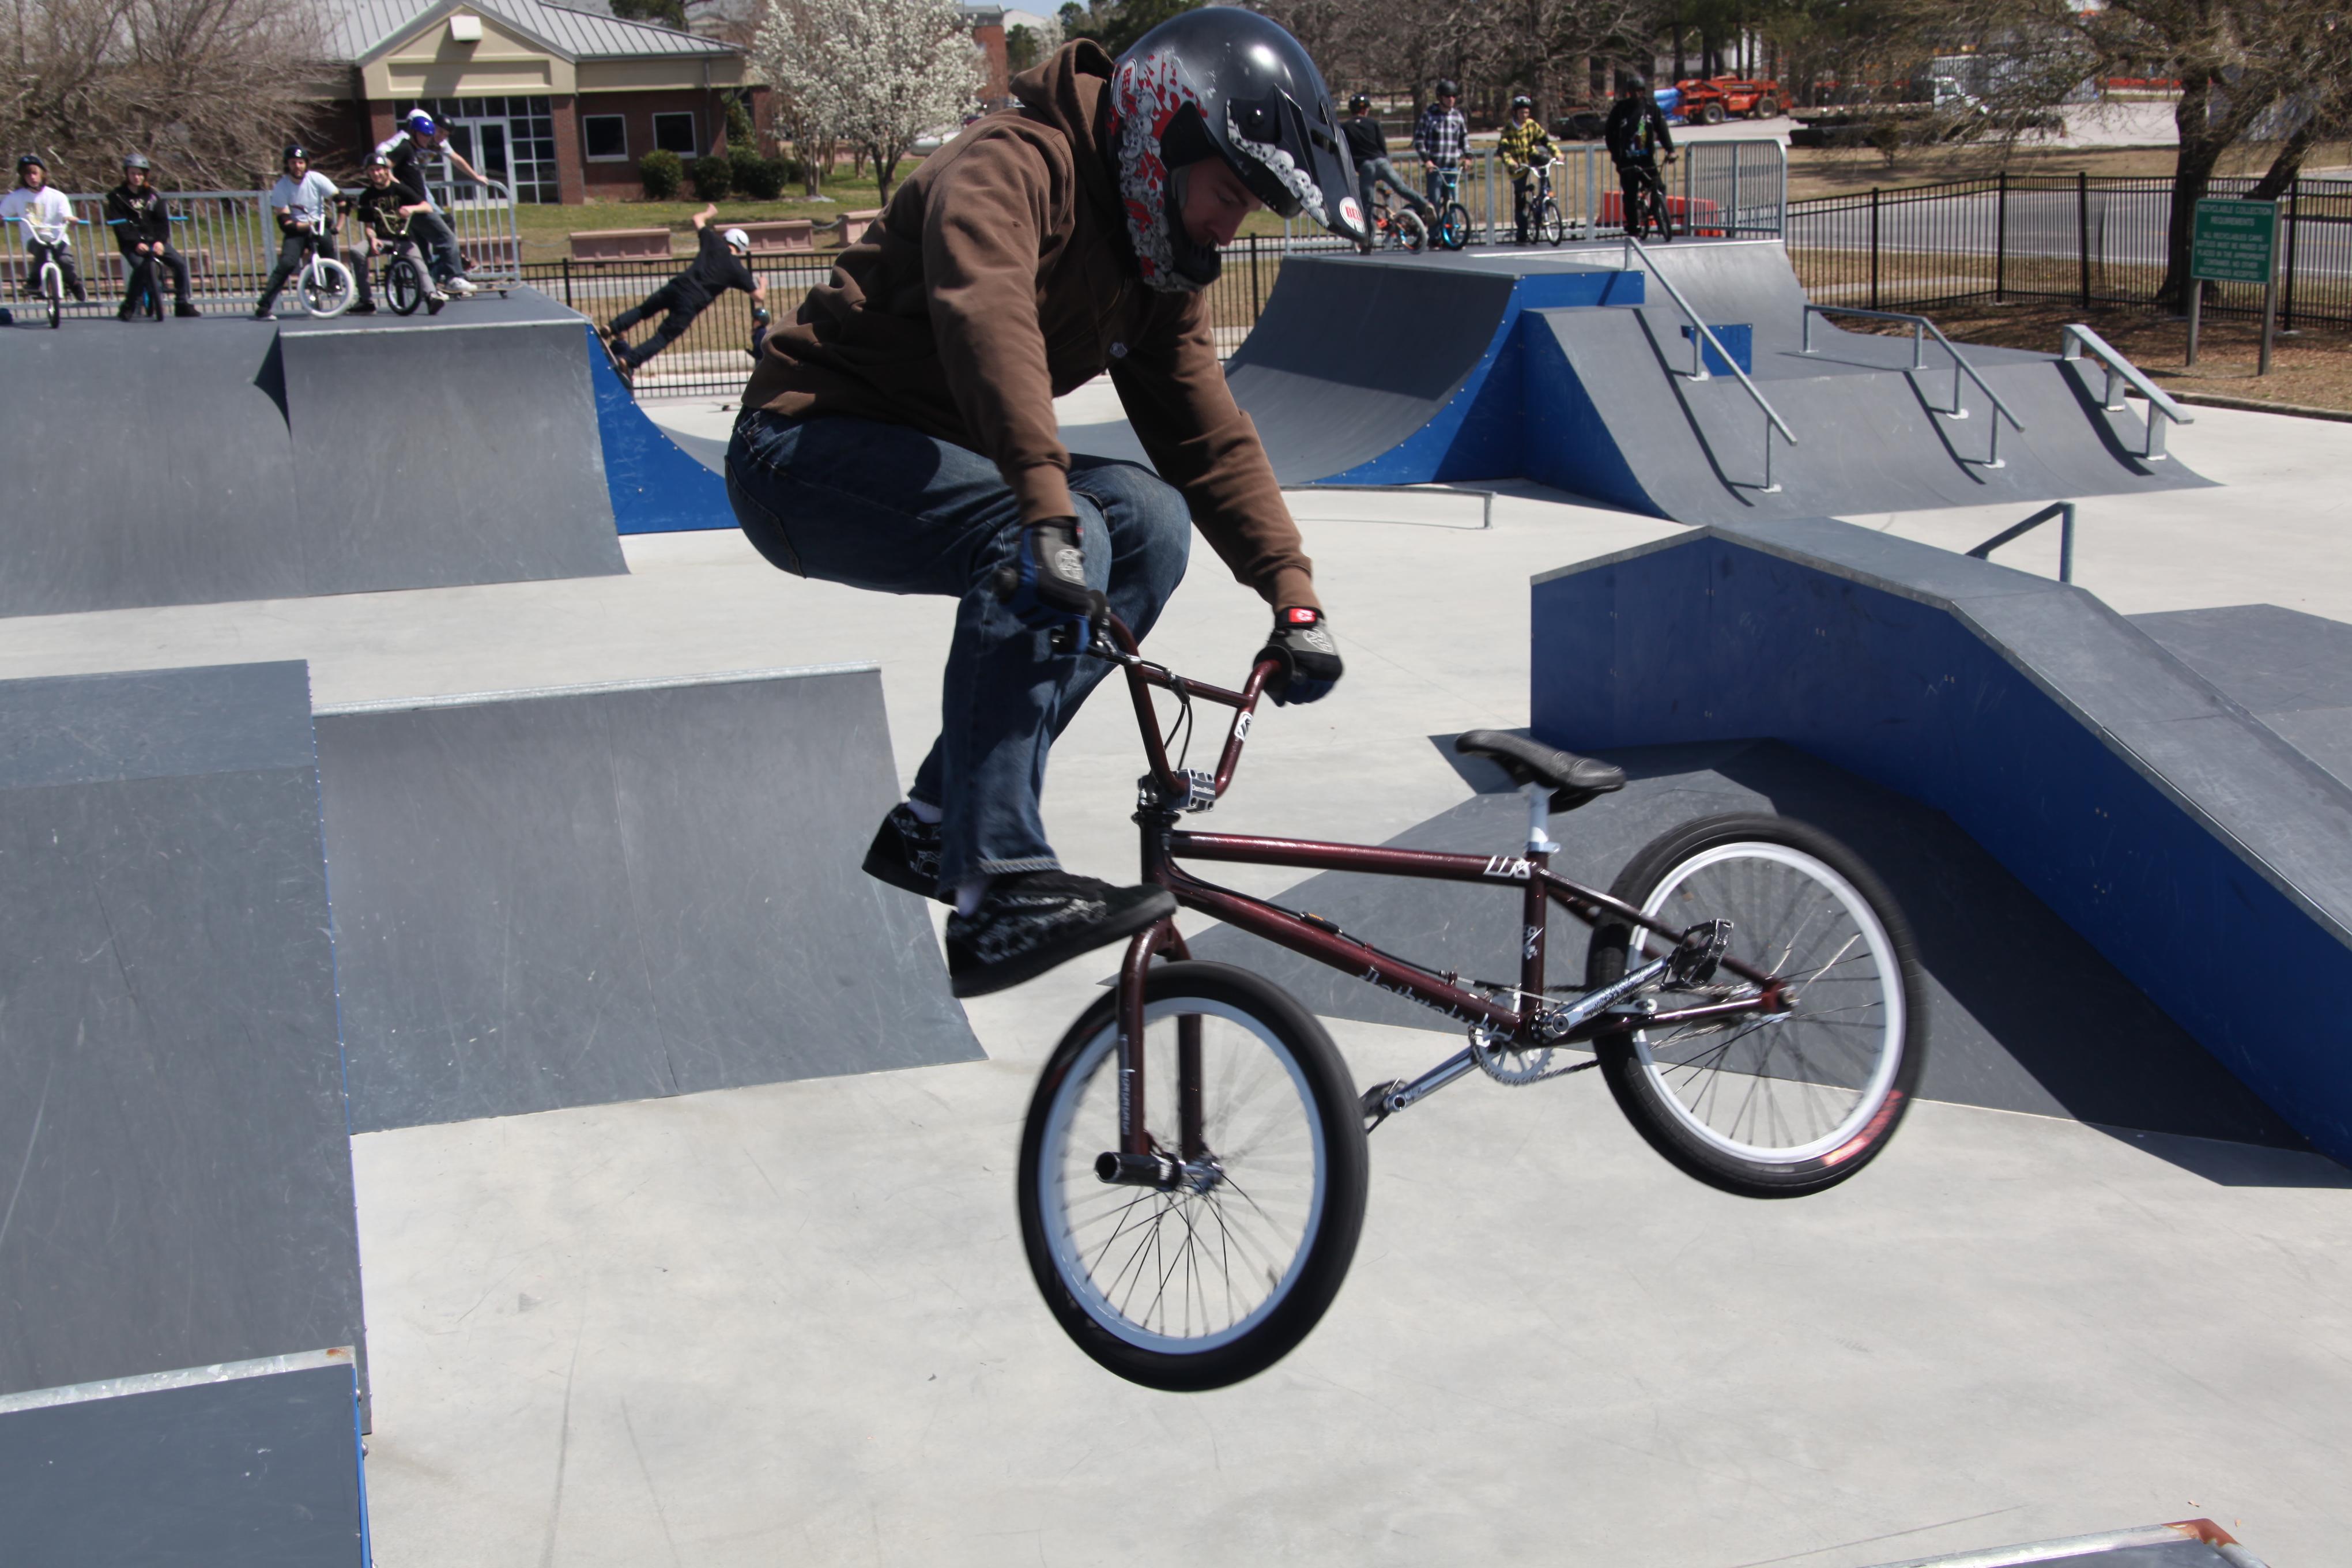 bmx tricks bmx - photo #44